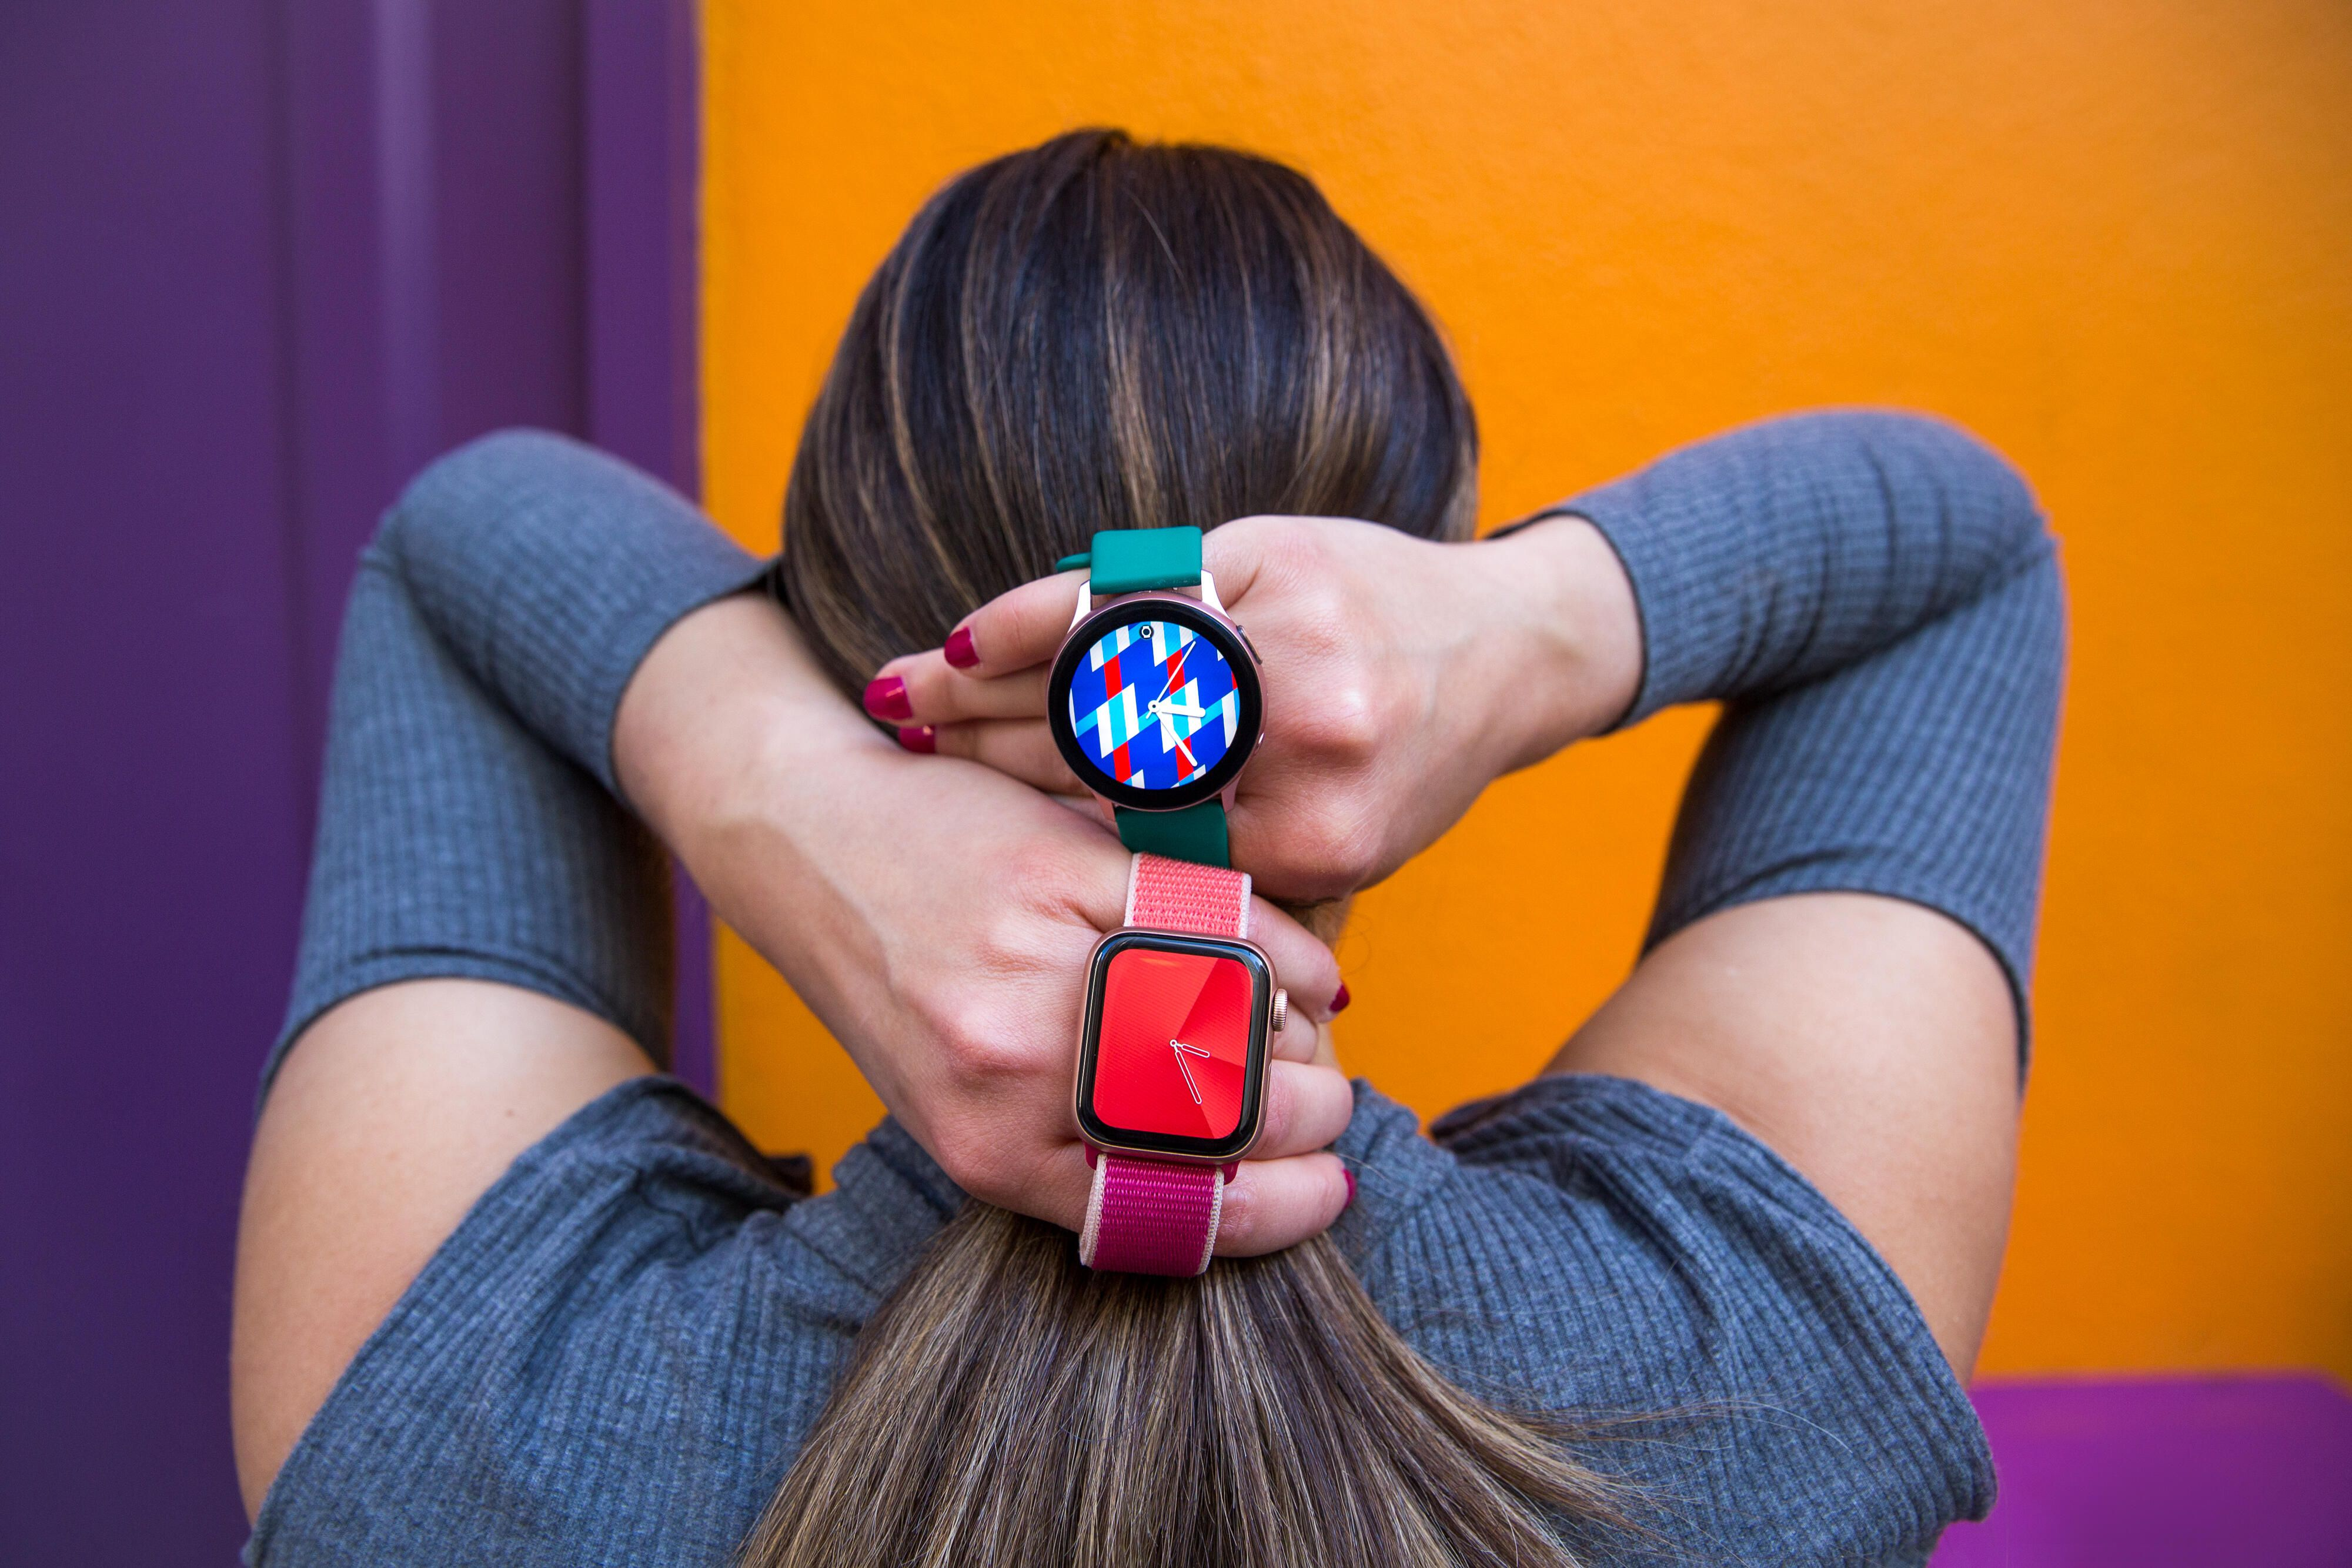 reloj-apple-samsung-watch-1